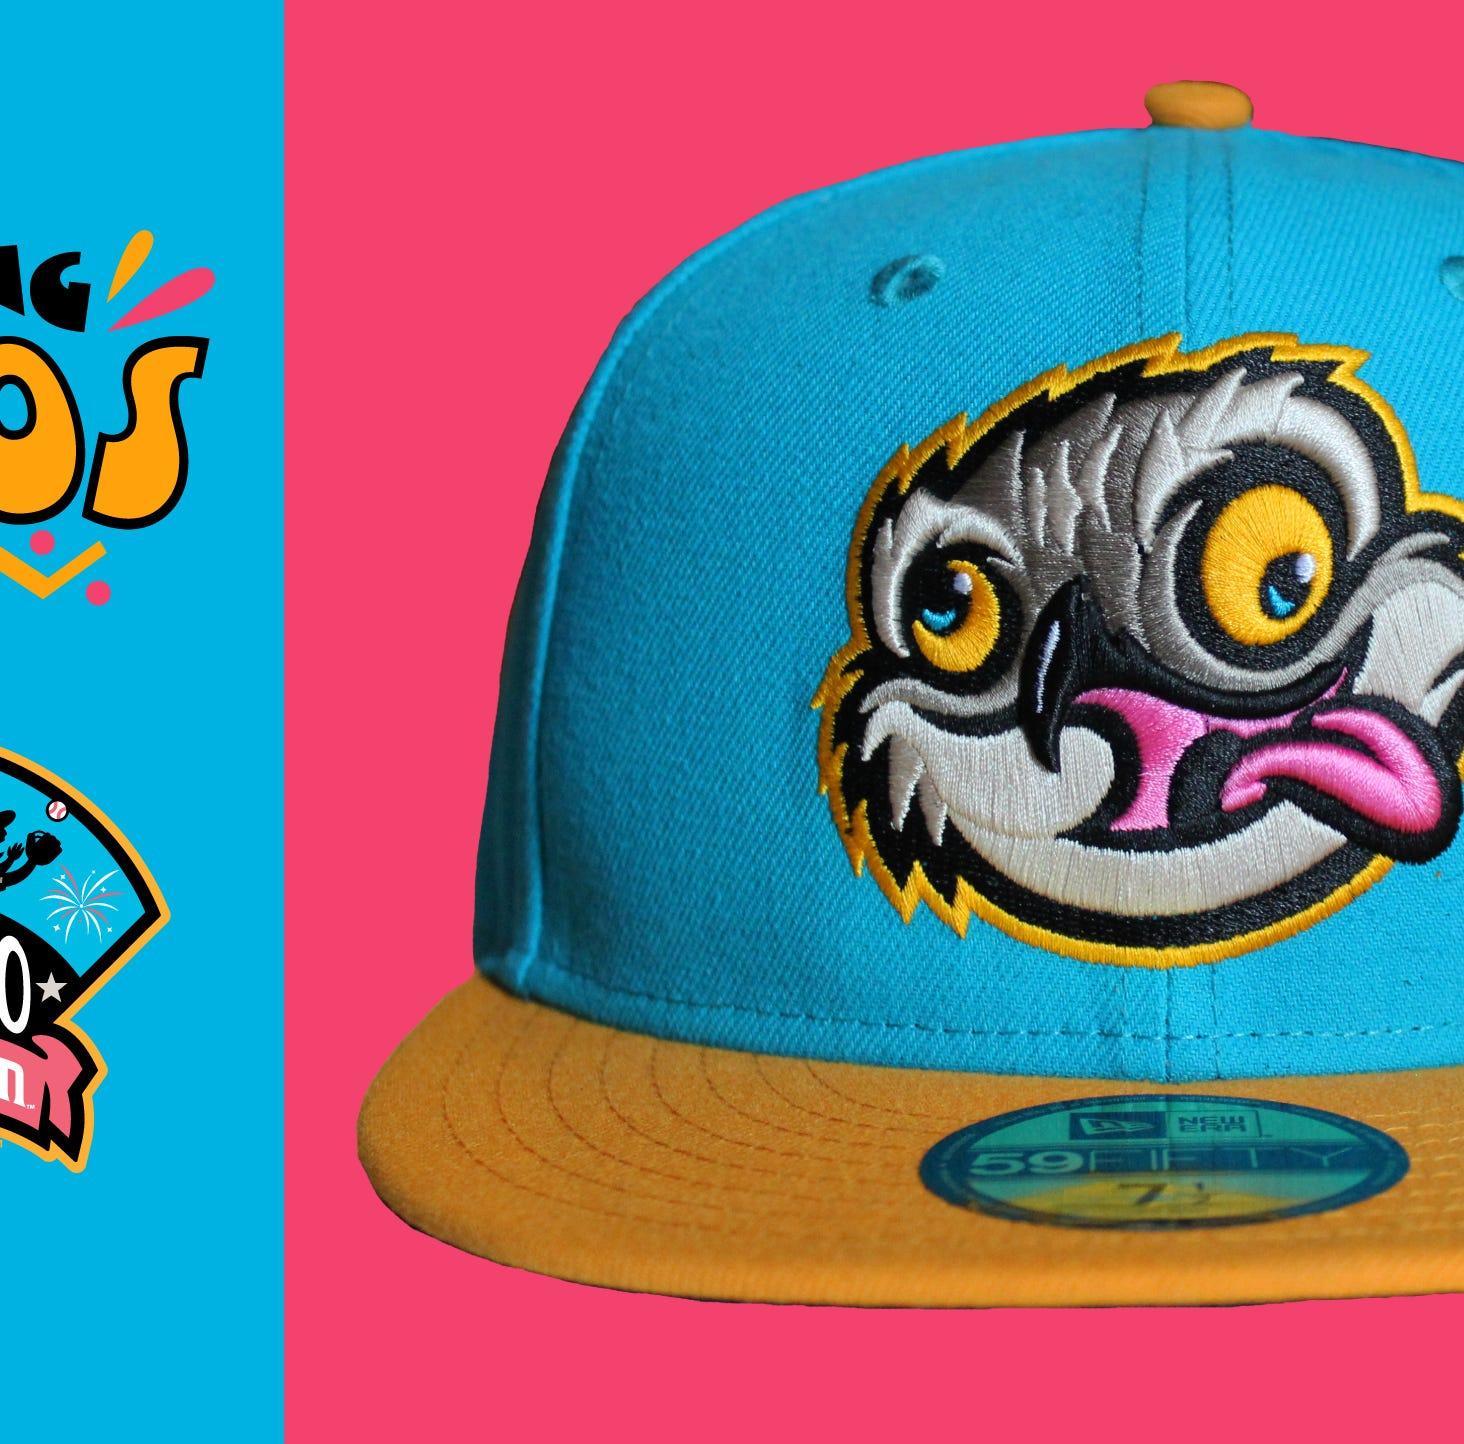 Minor League Baseball: Lansing Lugnuts to temporarily change logo, get new Latino identity